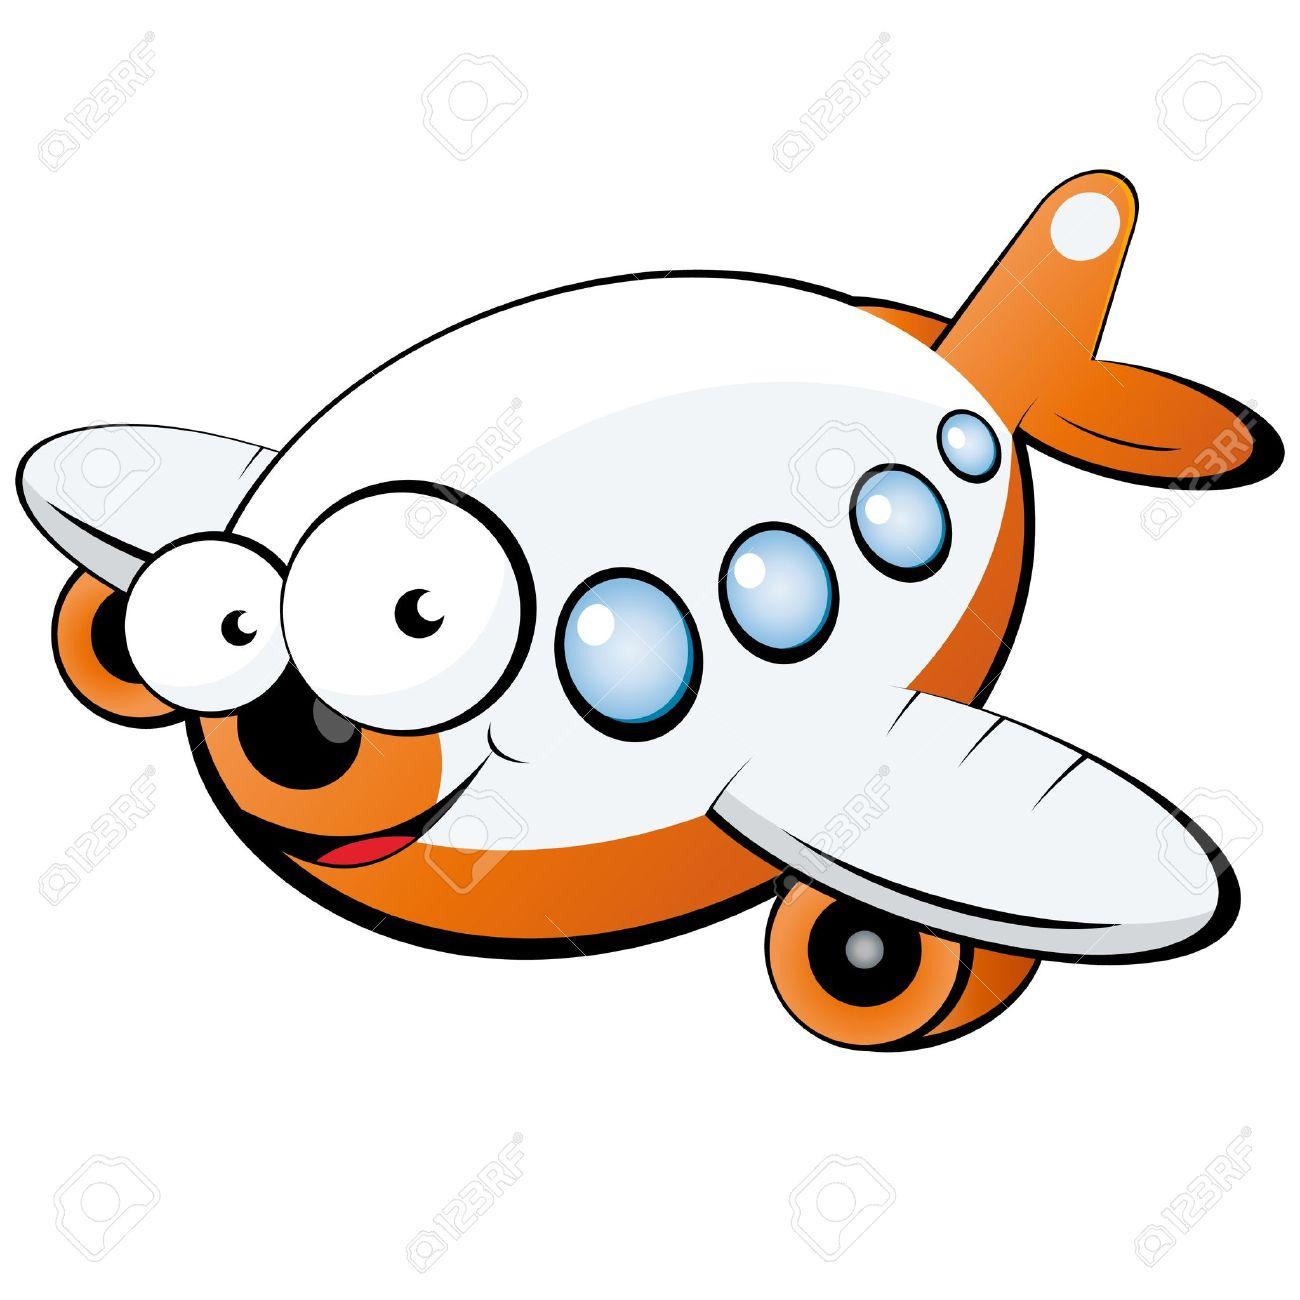 Funny Plane Clipart.